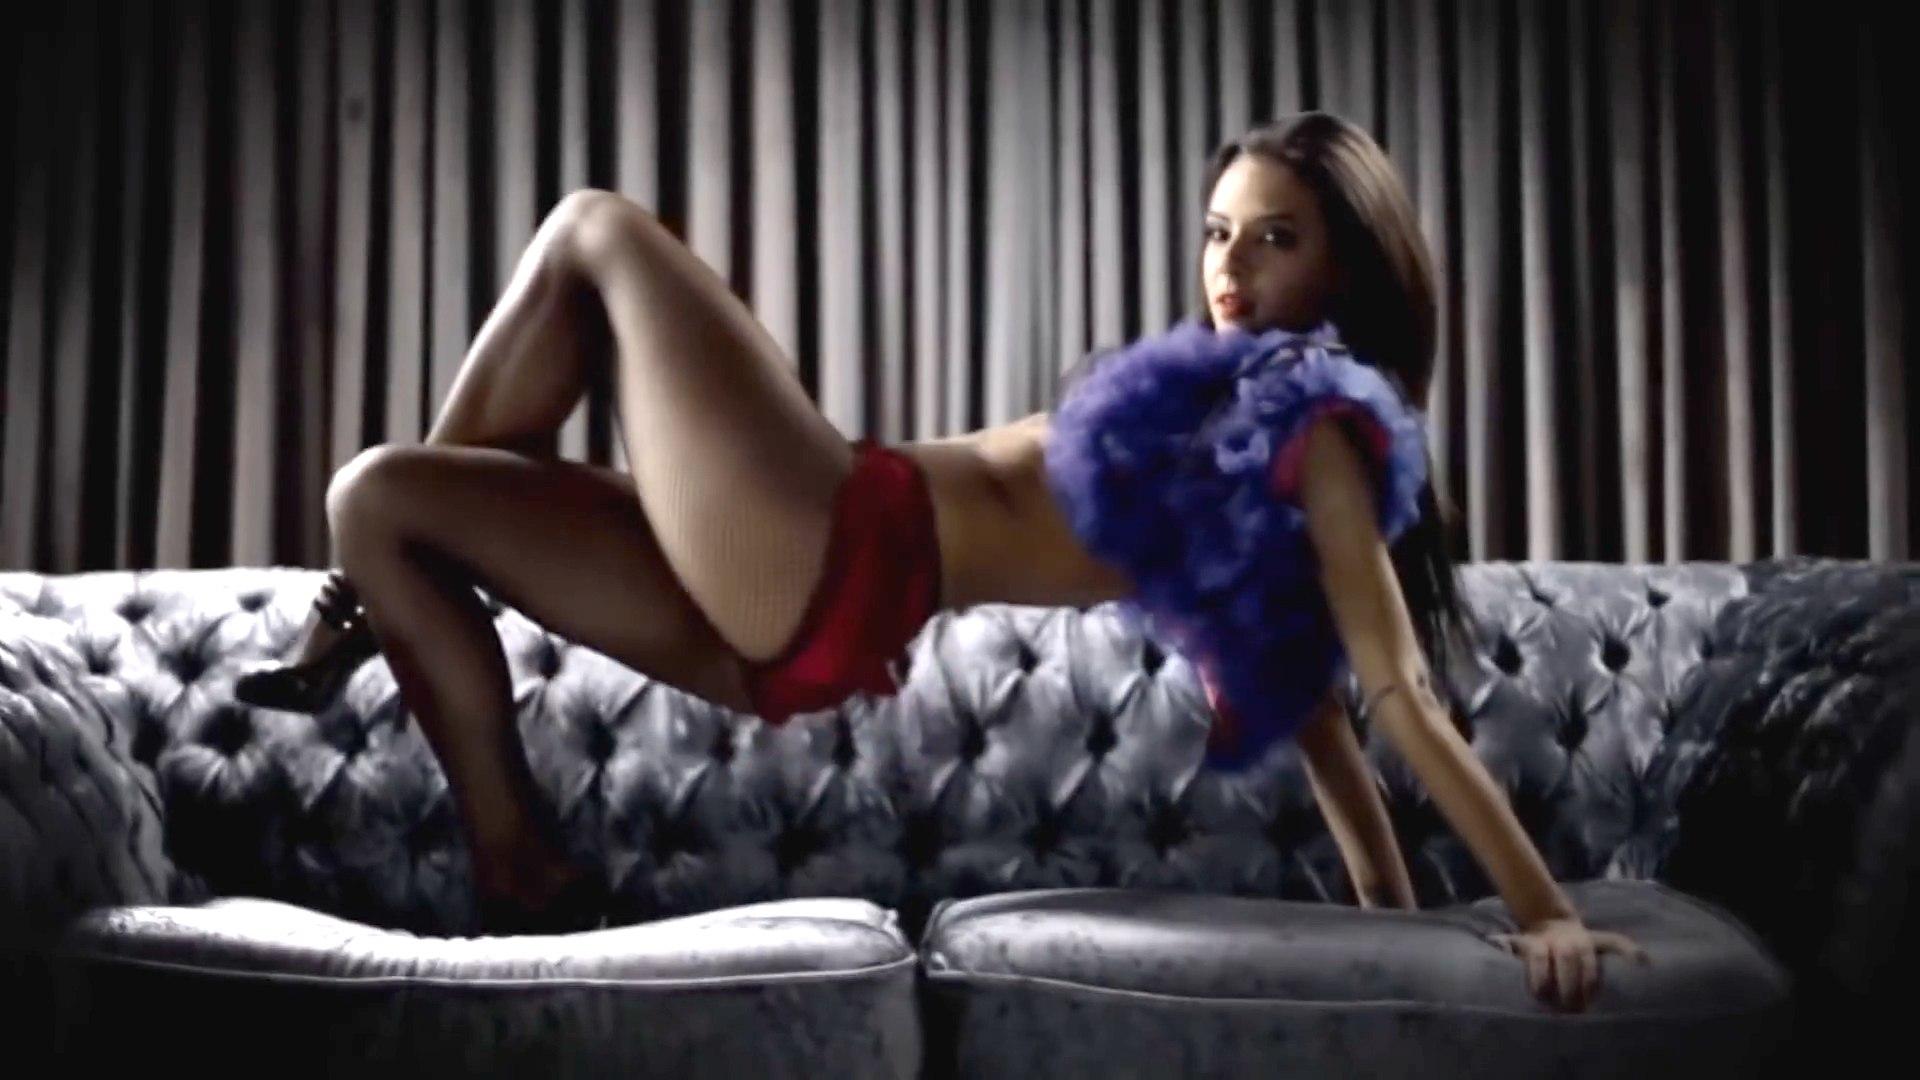 Грибы - Тает лёд / Kolya Funk & Lavrushkin feat. O'Neill Remix (Goldenito)